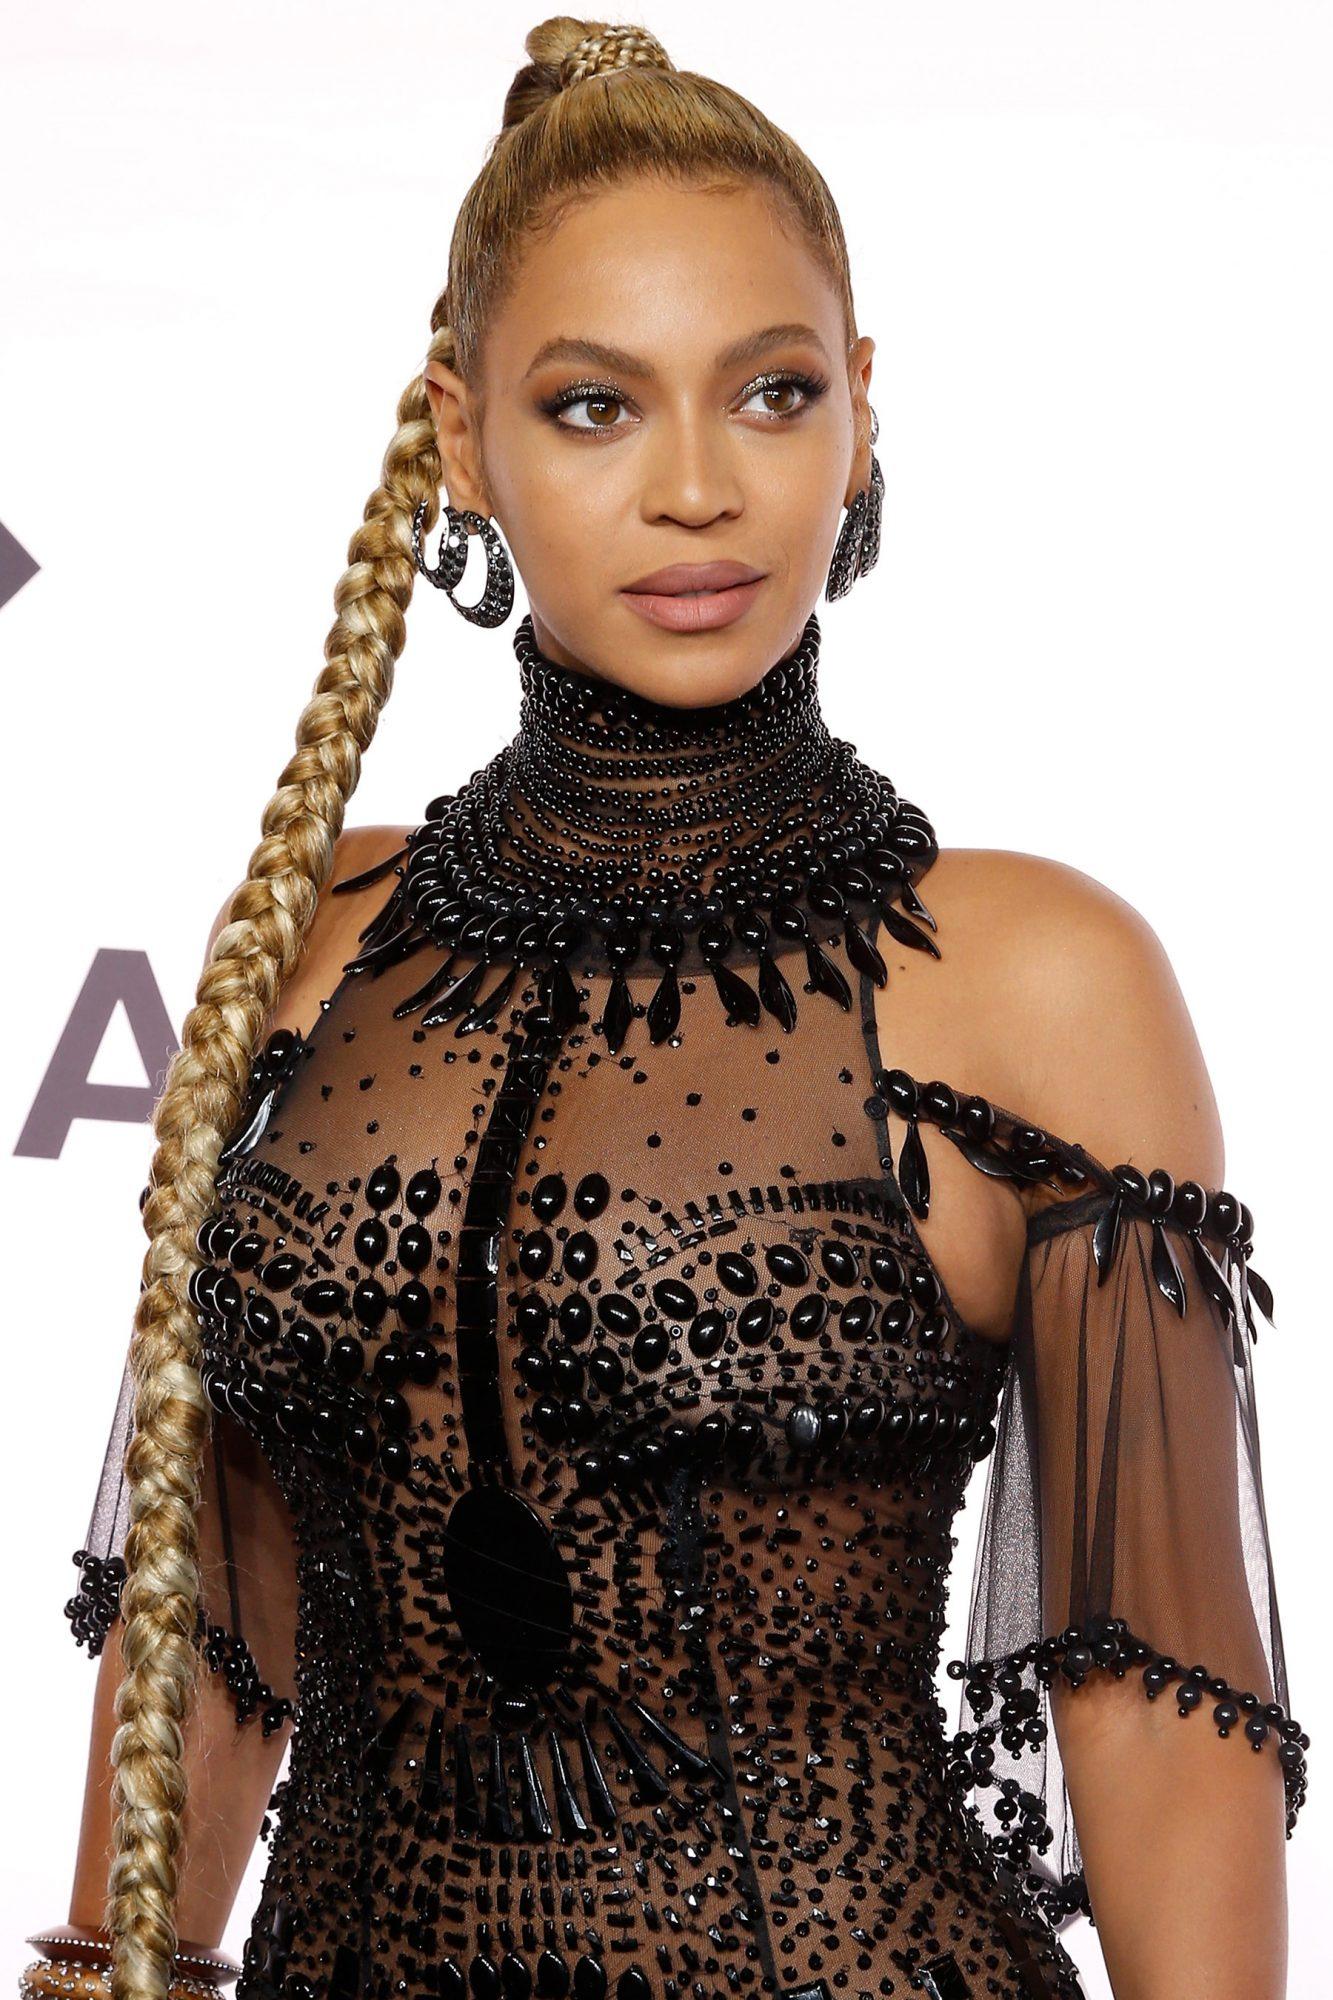 Beyonce announces pregnancy and breaks internet